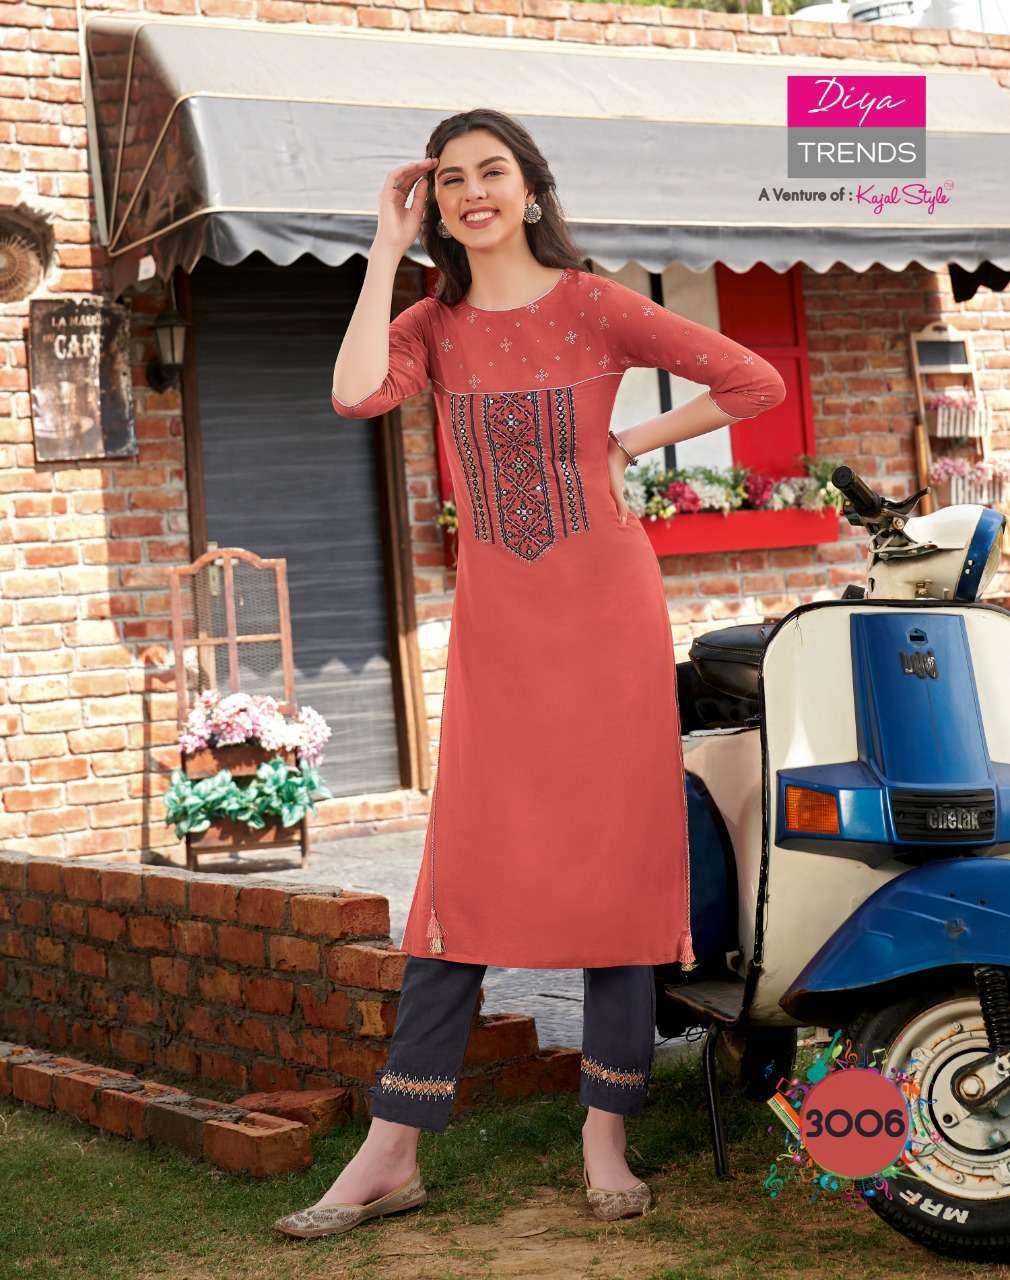 Diya Trends Forever Vol 3 by Kajal Style Kurti with Pant Wholesale Catalog 12 Pcs 7 - Diya Trends Forever Vol 3 by Kajal Style Kurti with Pant Wholesale Catalog 12 Pcs